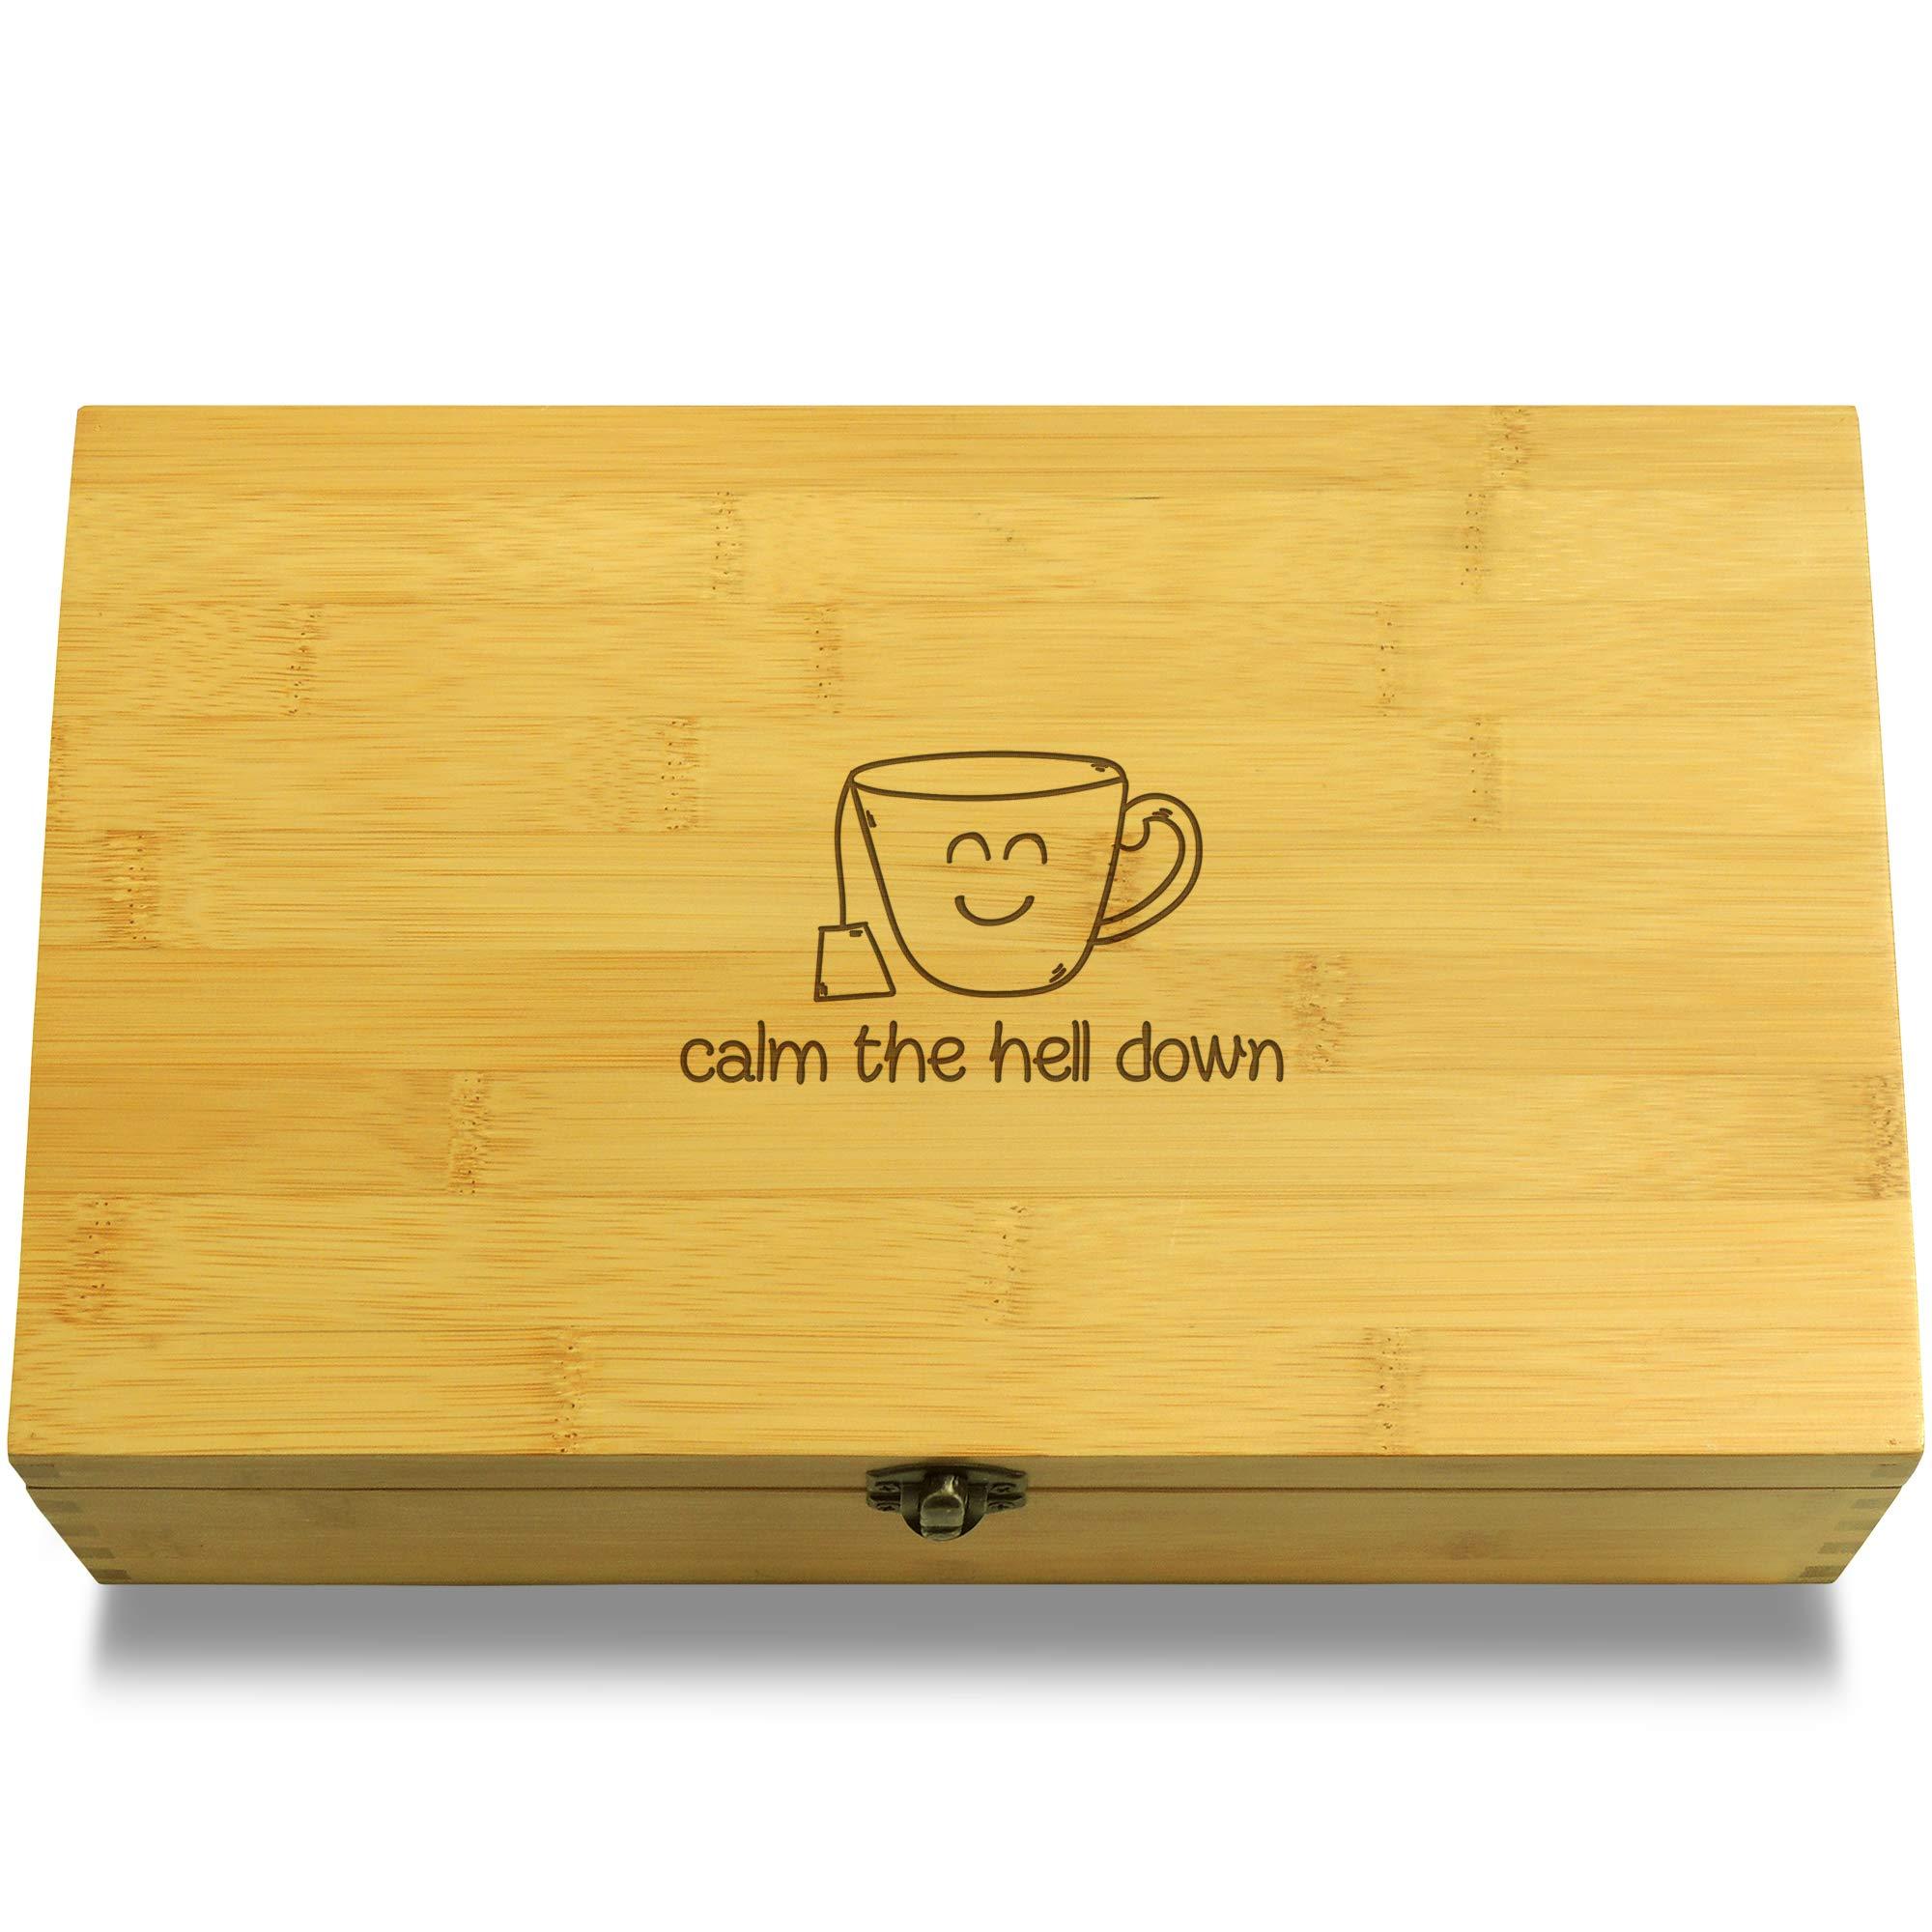 Cookbook People Calm Down Multikeep Tea Box - Decorative Bamboo Wood Adjustable Organizer